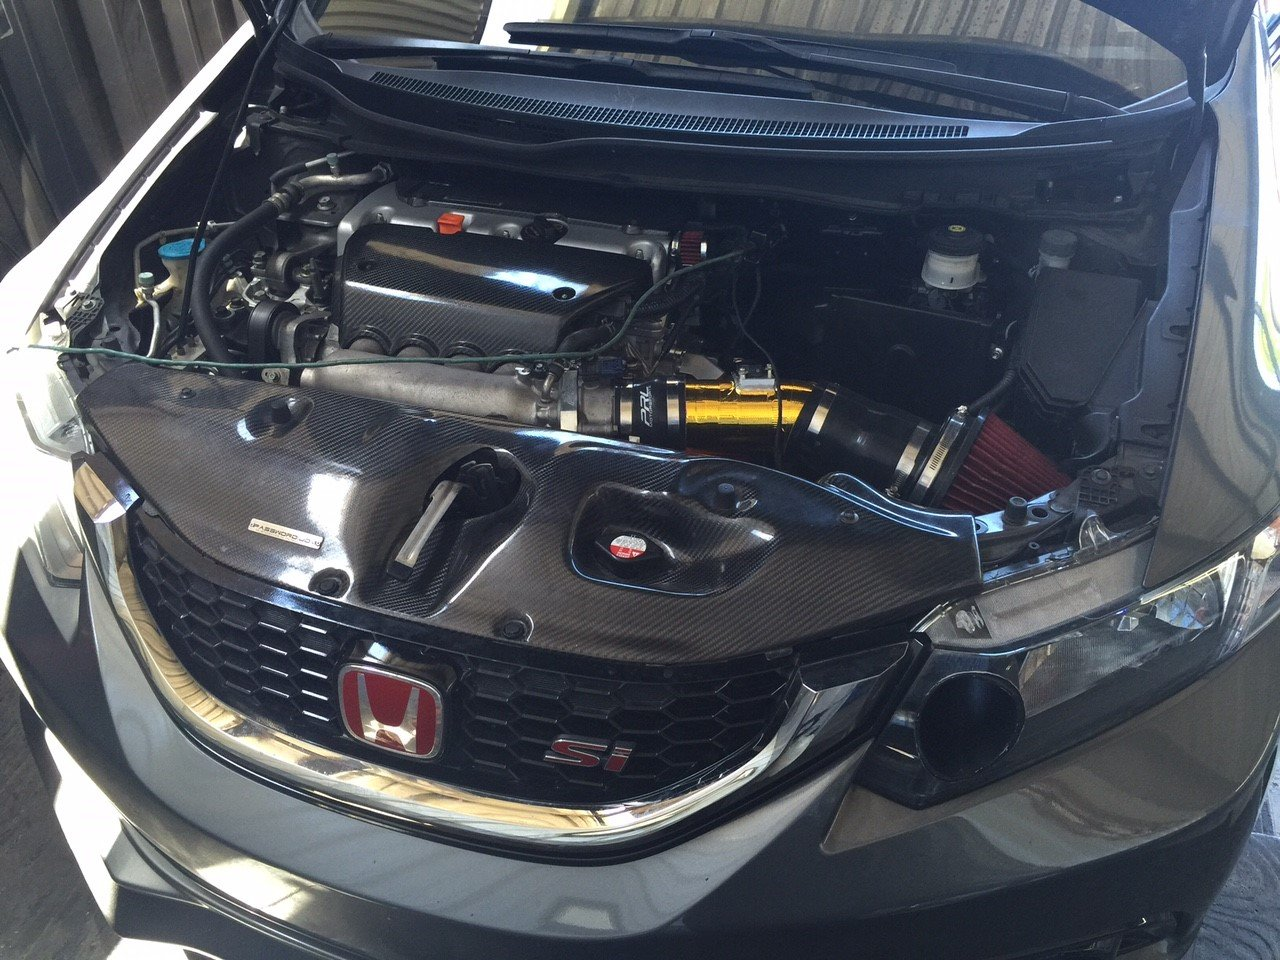 2013 Civic Si K24z7/K20-engine-bay-5.jpg